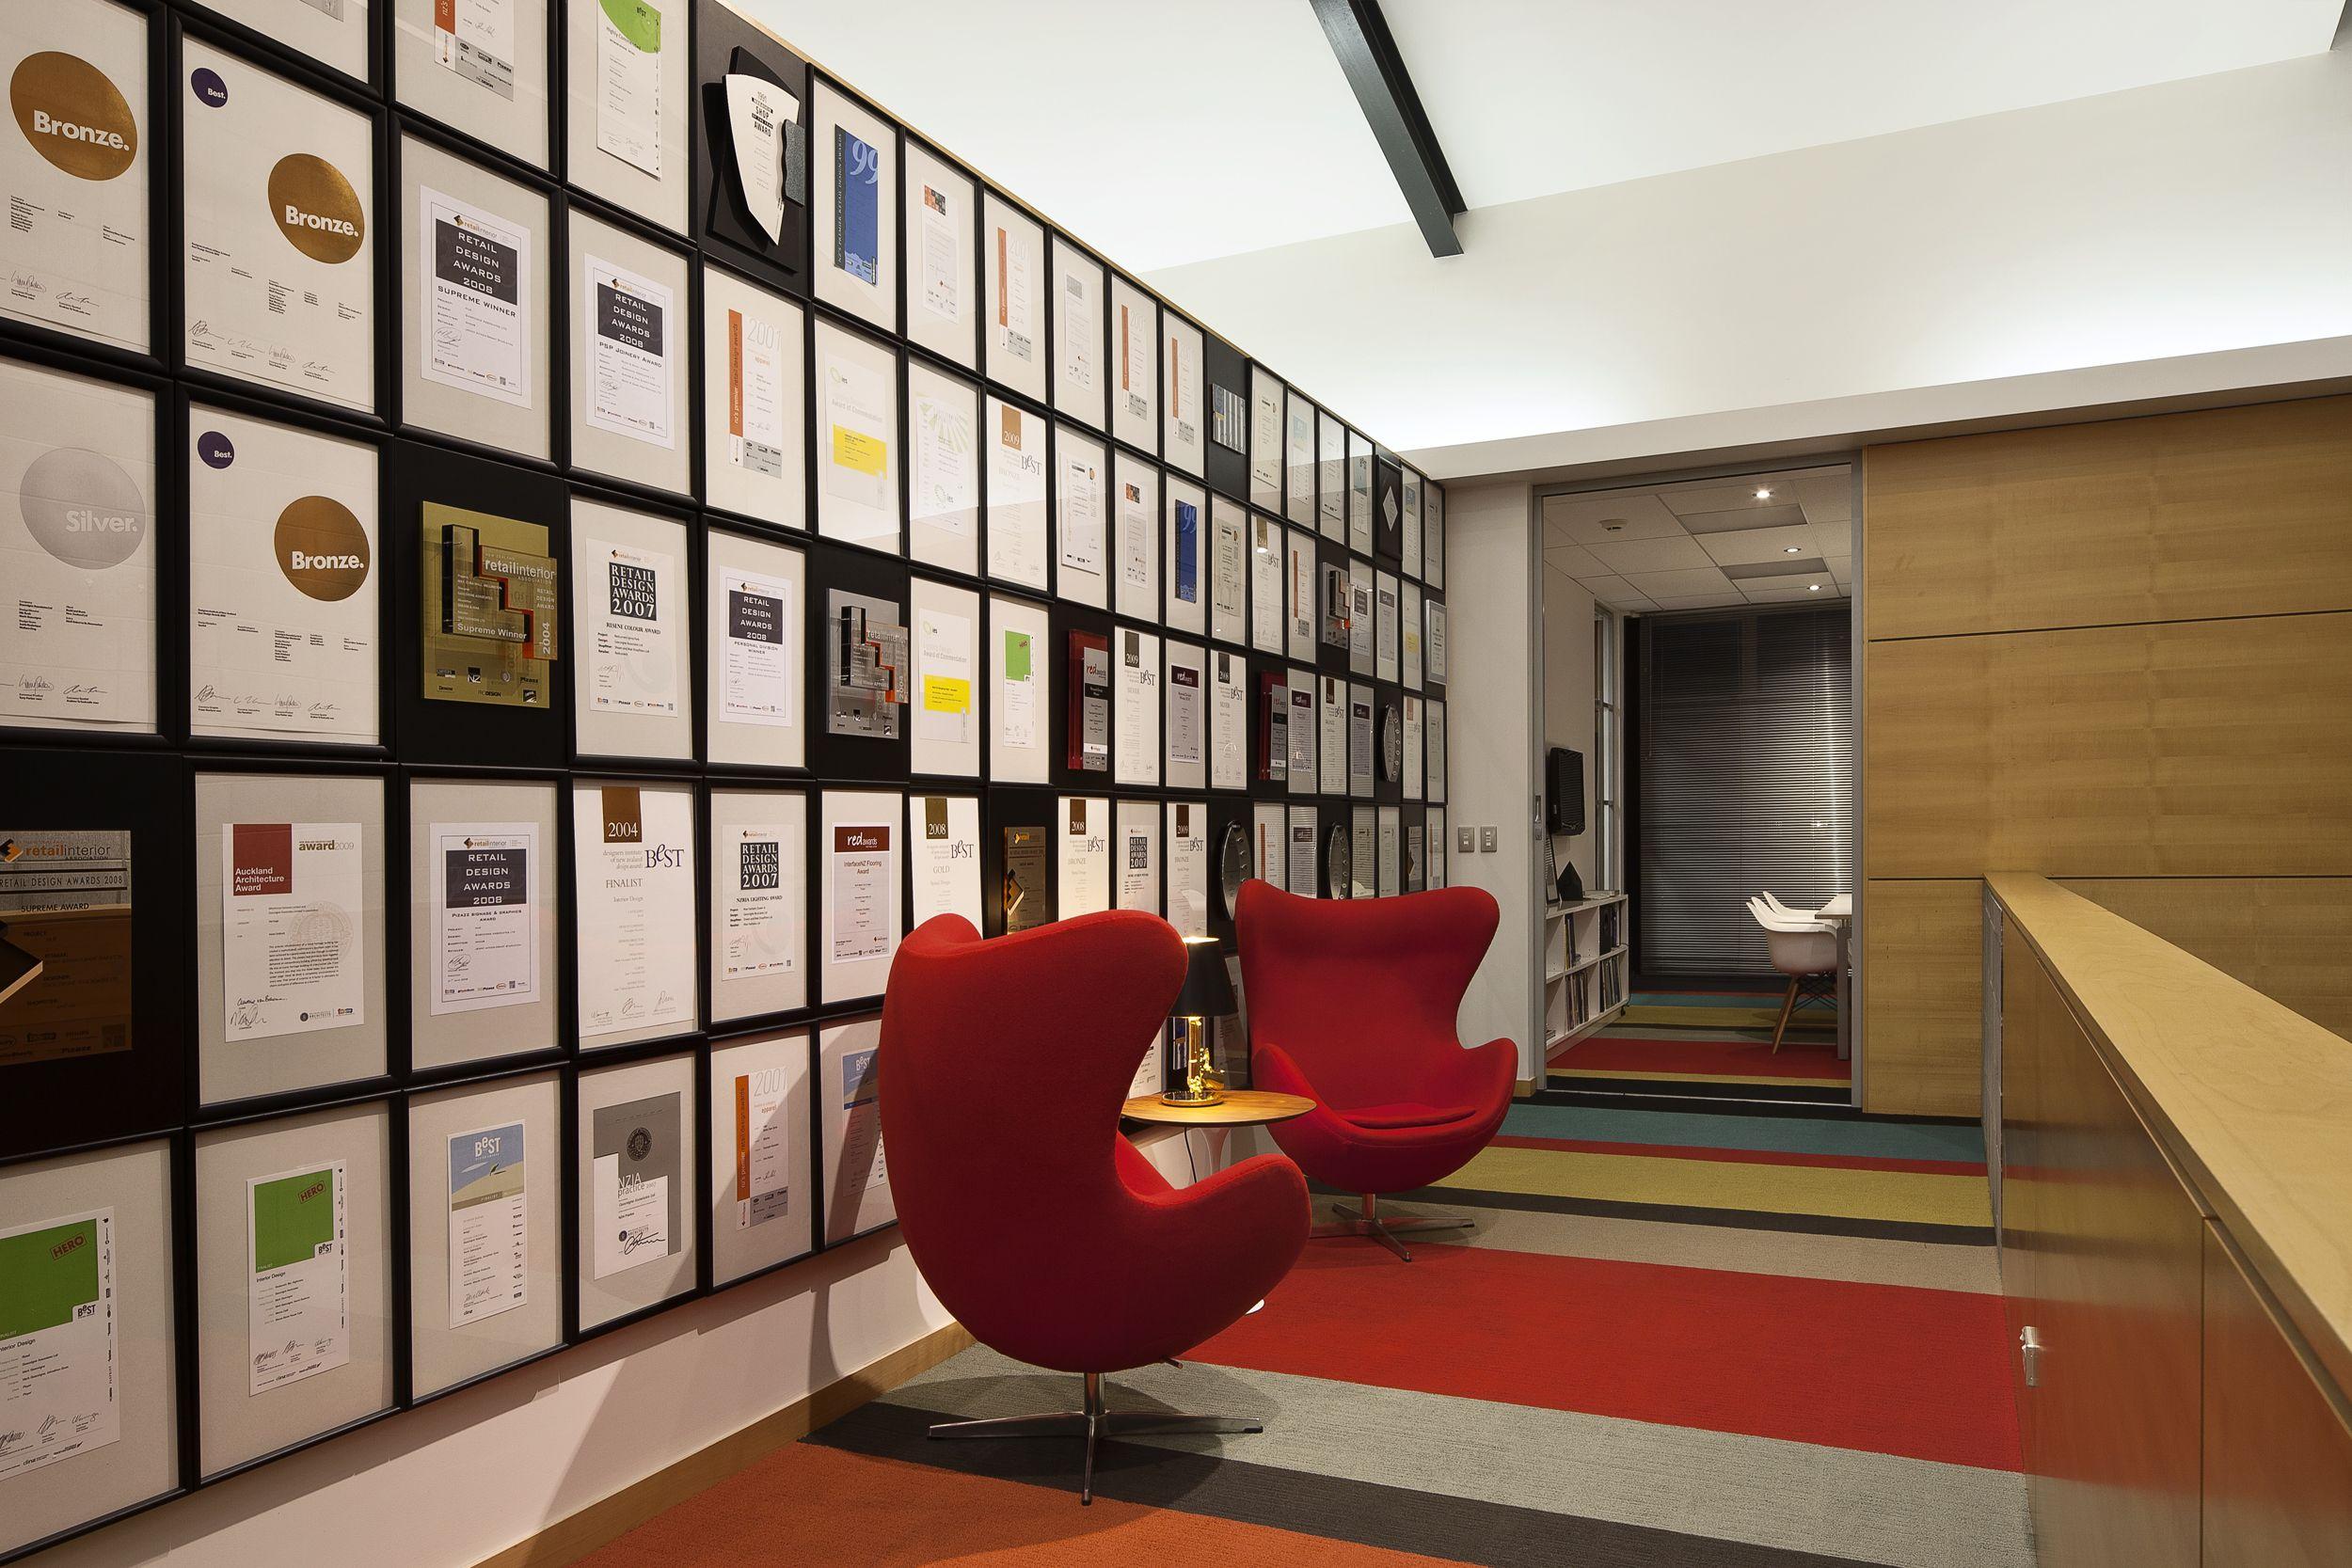 Best Design Awards Certificates On Display Display Wall Design Award Display Design Awards